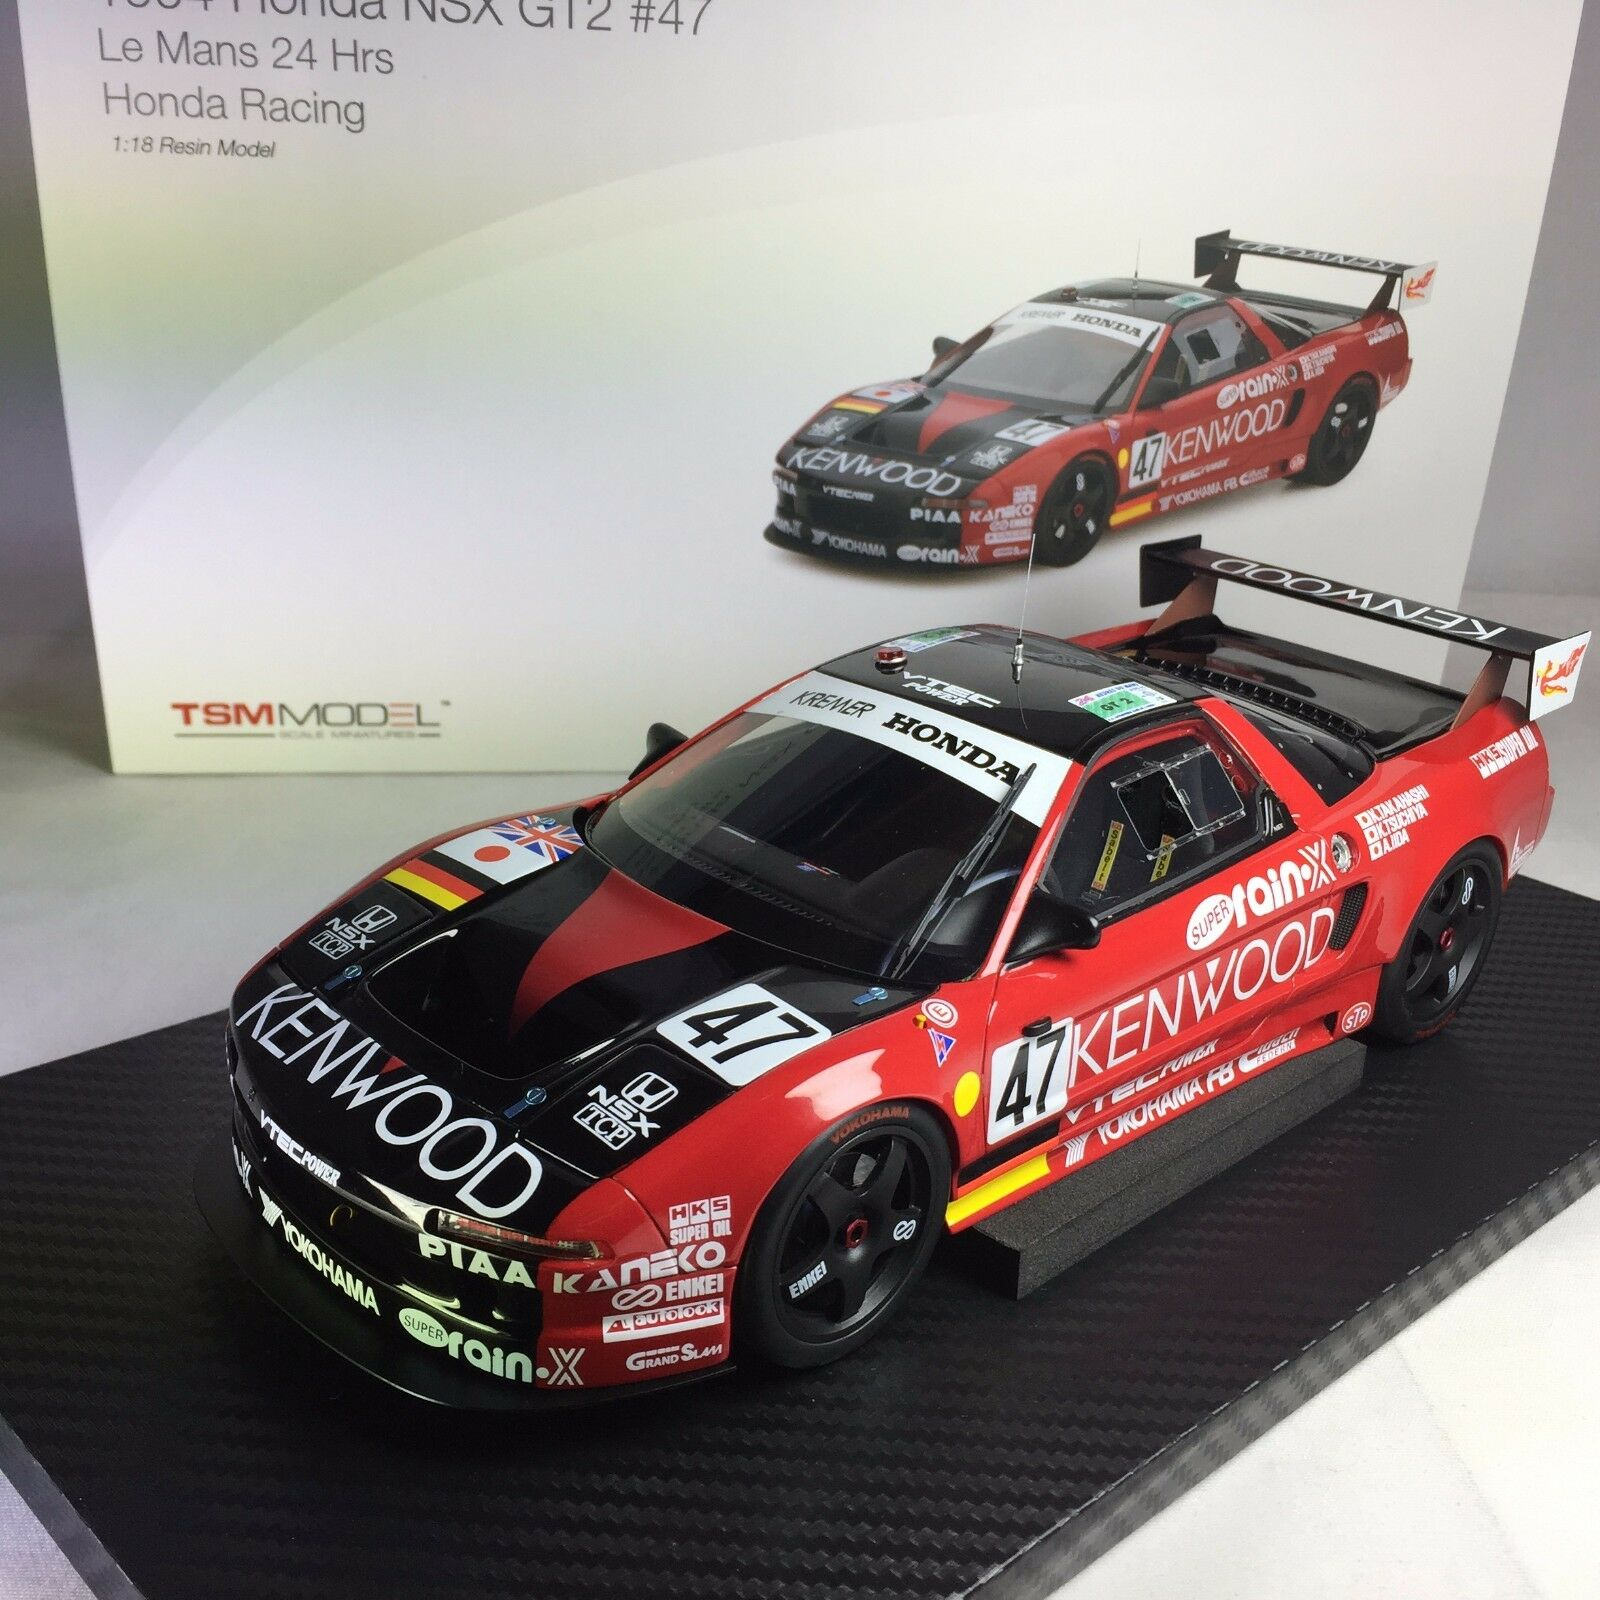 promozioni di sconto 1 18 18 18 TSM  TSM151809R Honda NSX GT2 Leuomos 24 Hrs Honda Racing  ordina ora con grande sconto e consegna gratuita